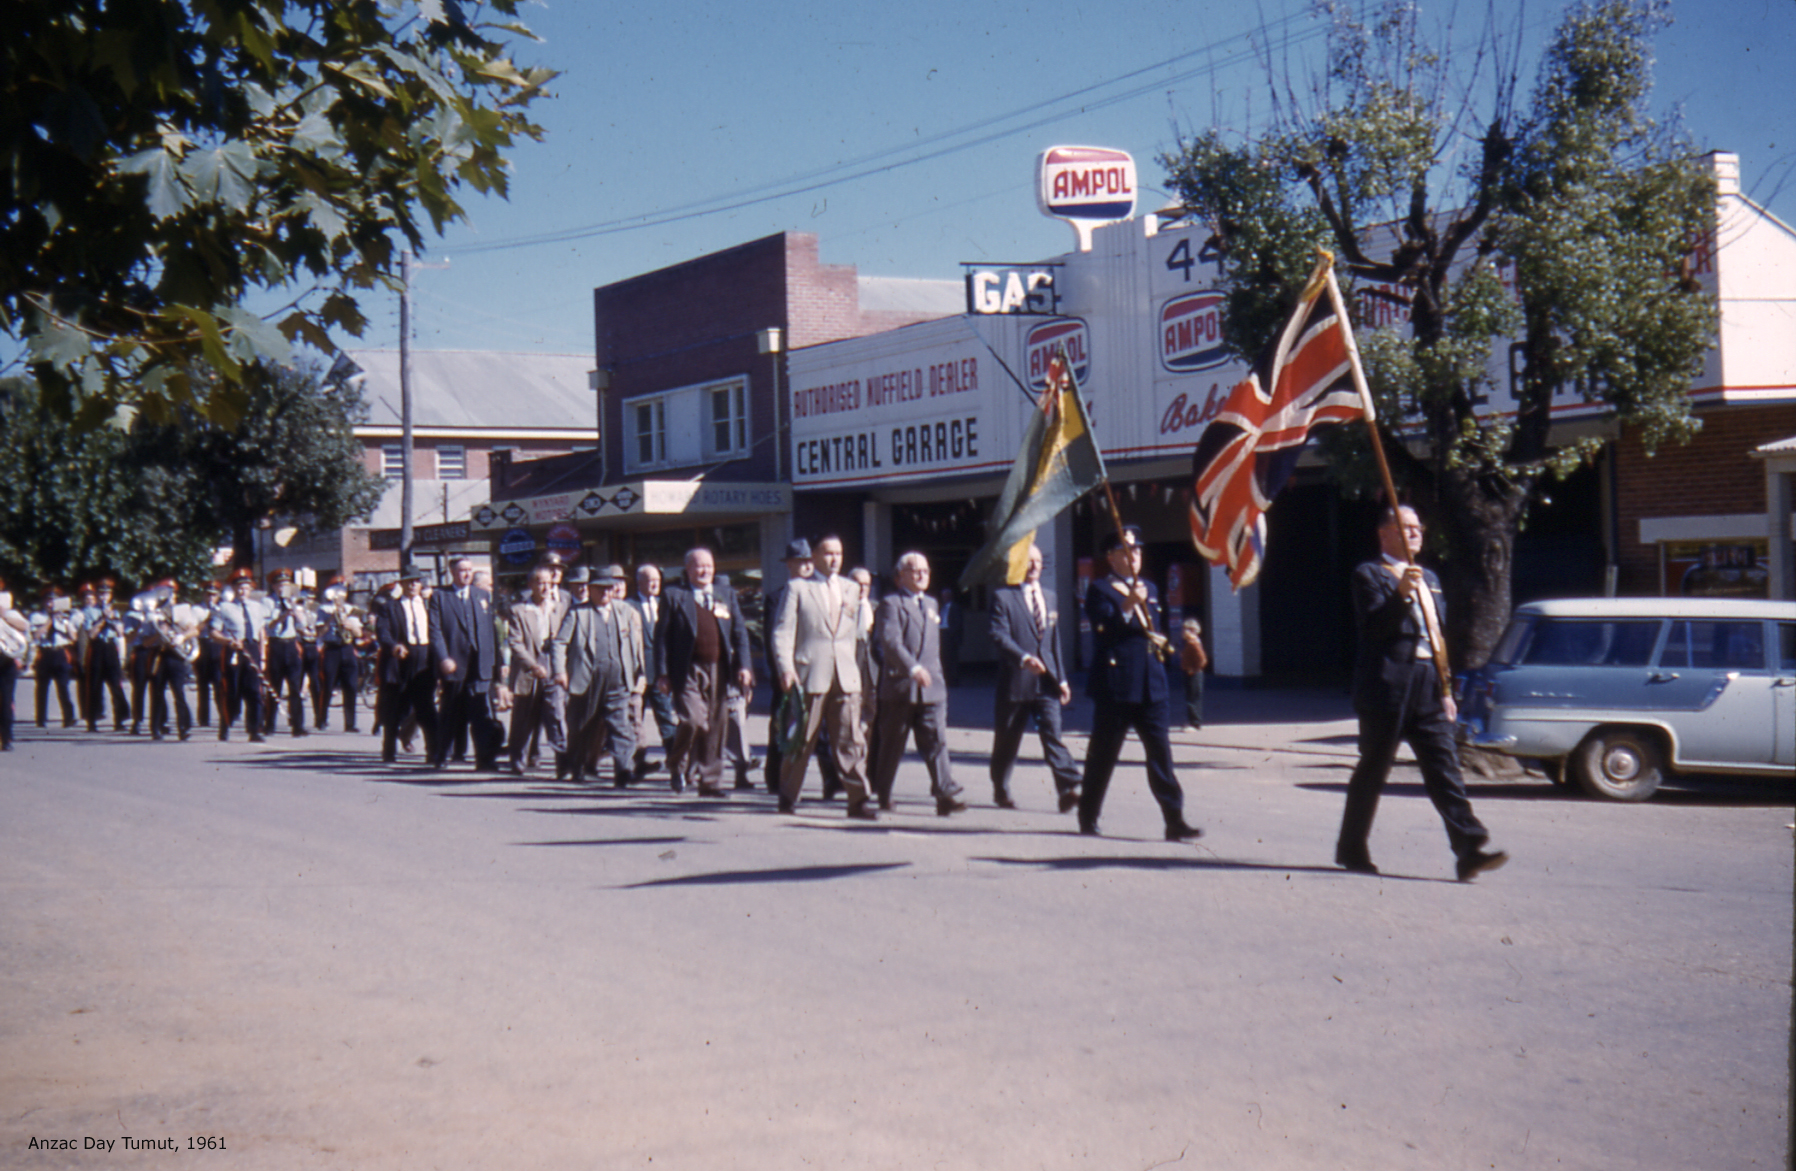 ChrisBonnorAnzac Day 1961